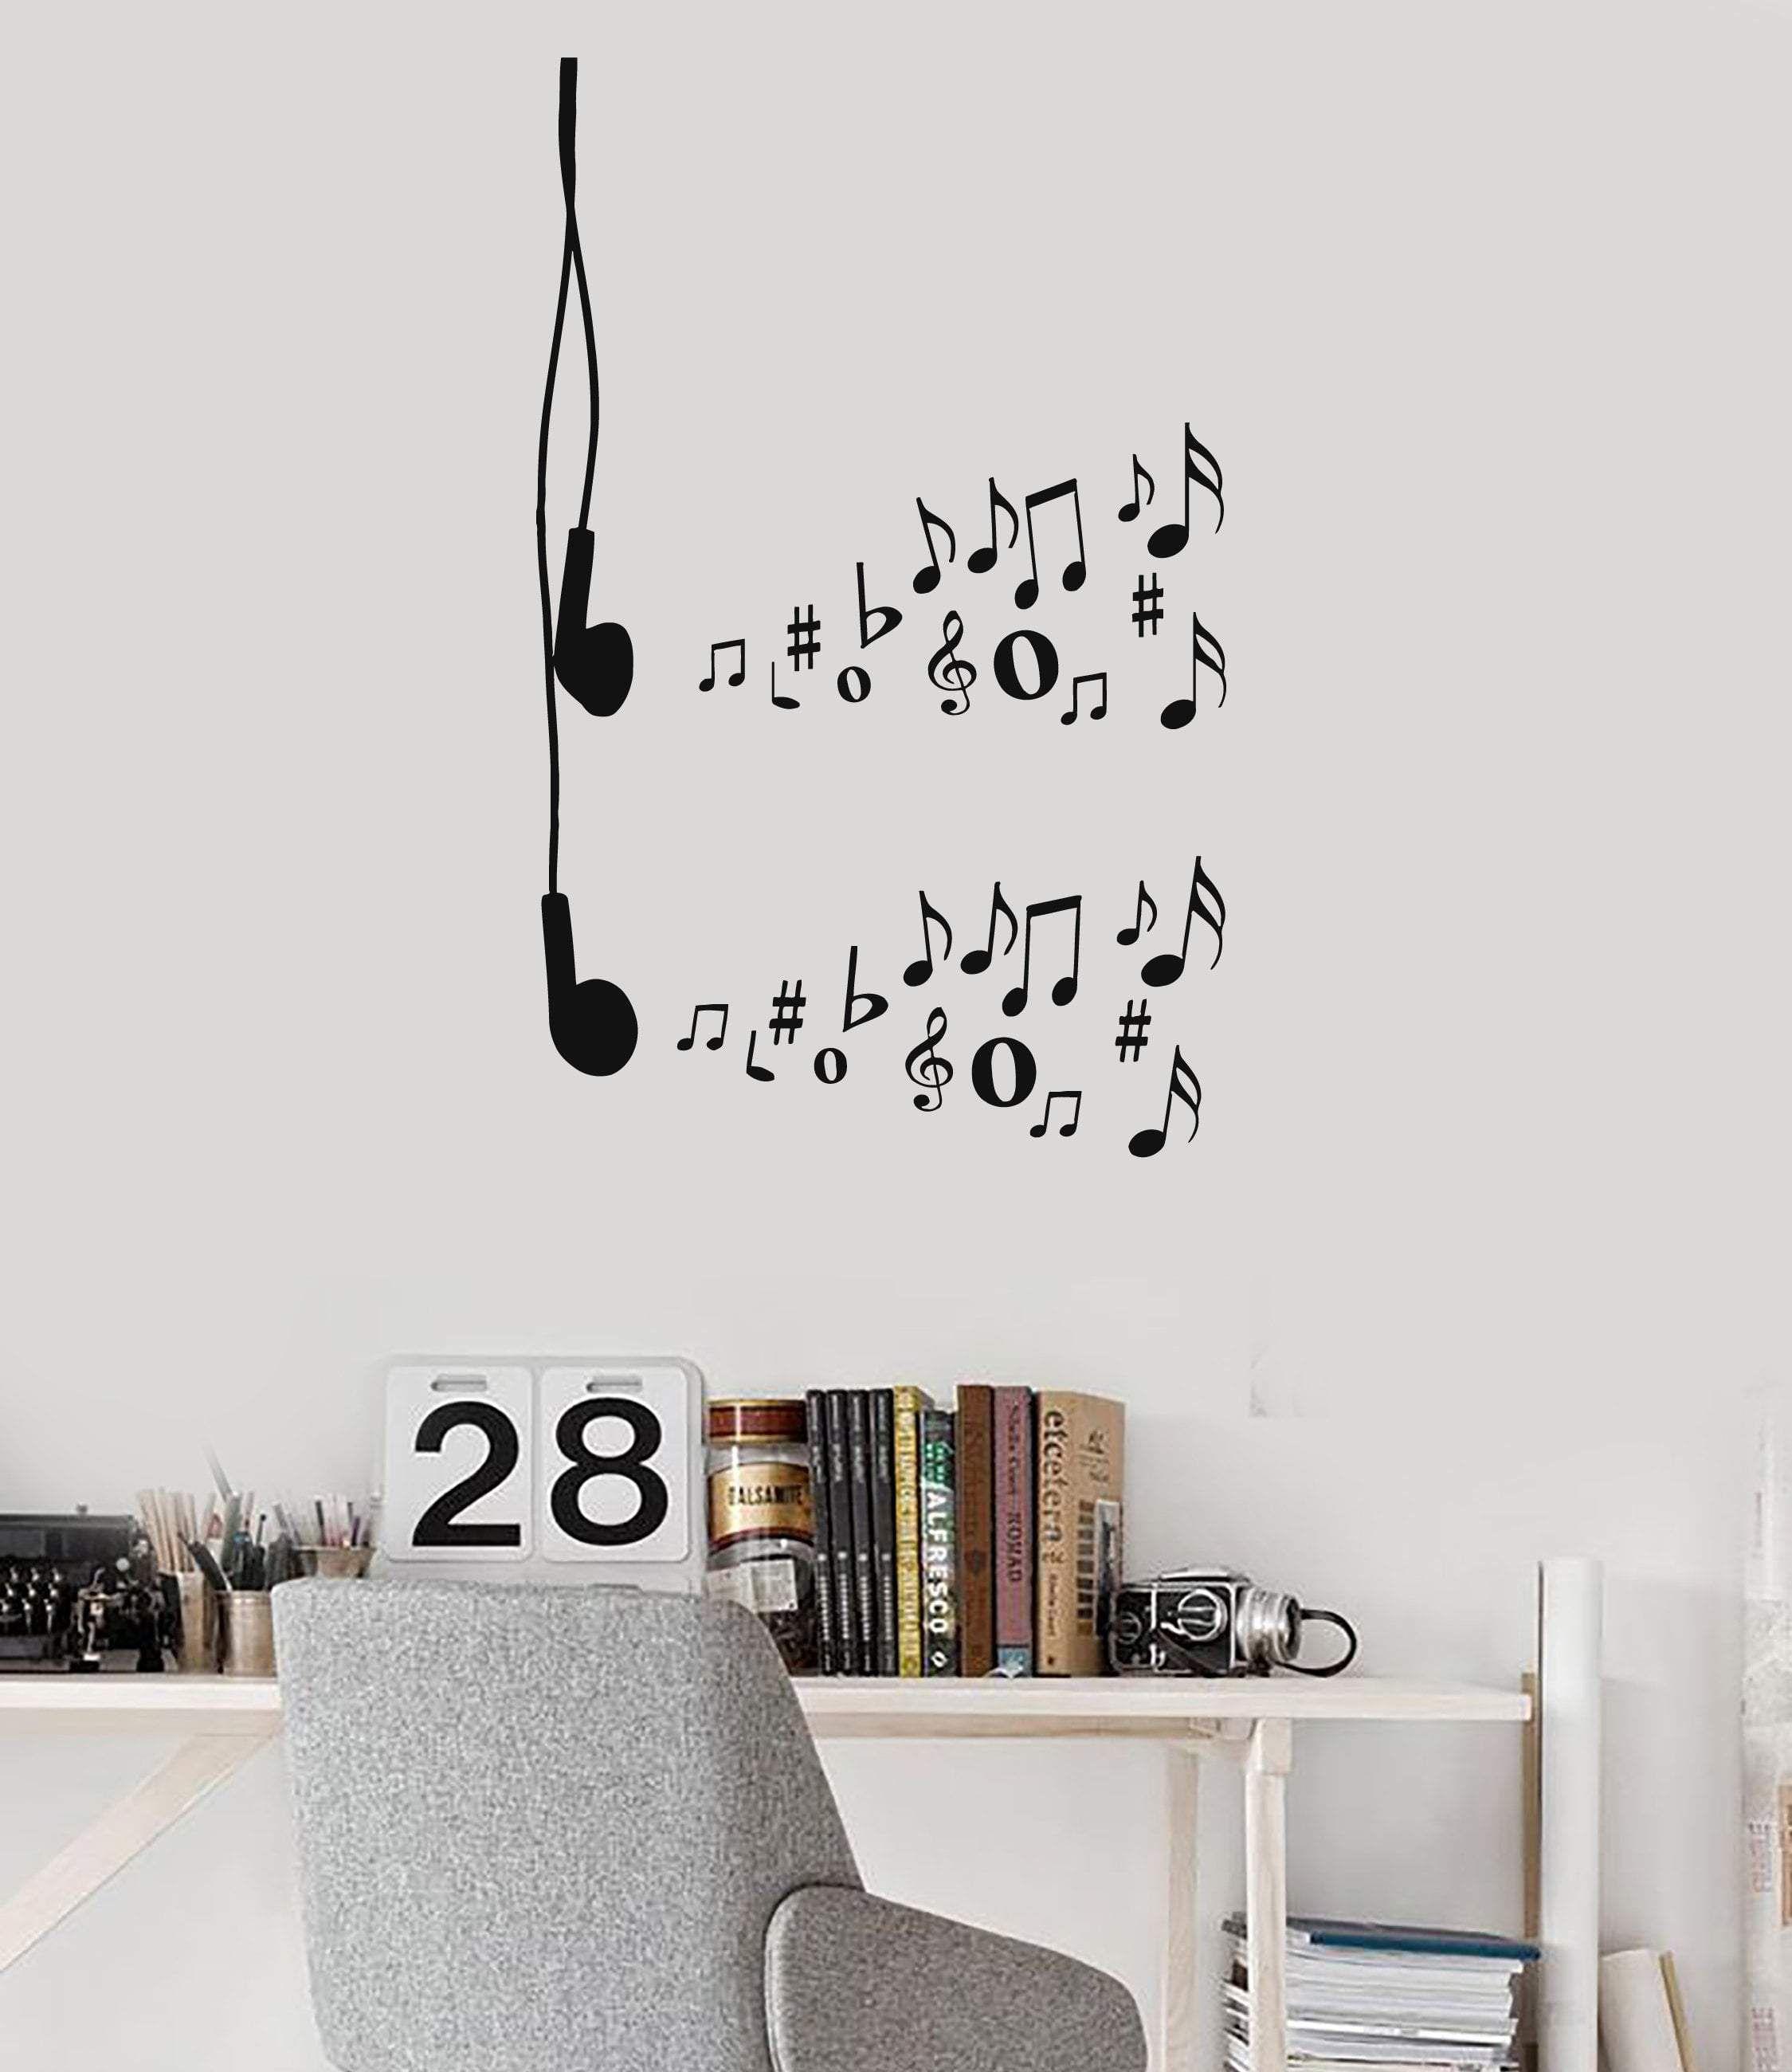 Vinyl wall decal earphones music notes musical art teen room stickers mural ig5255